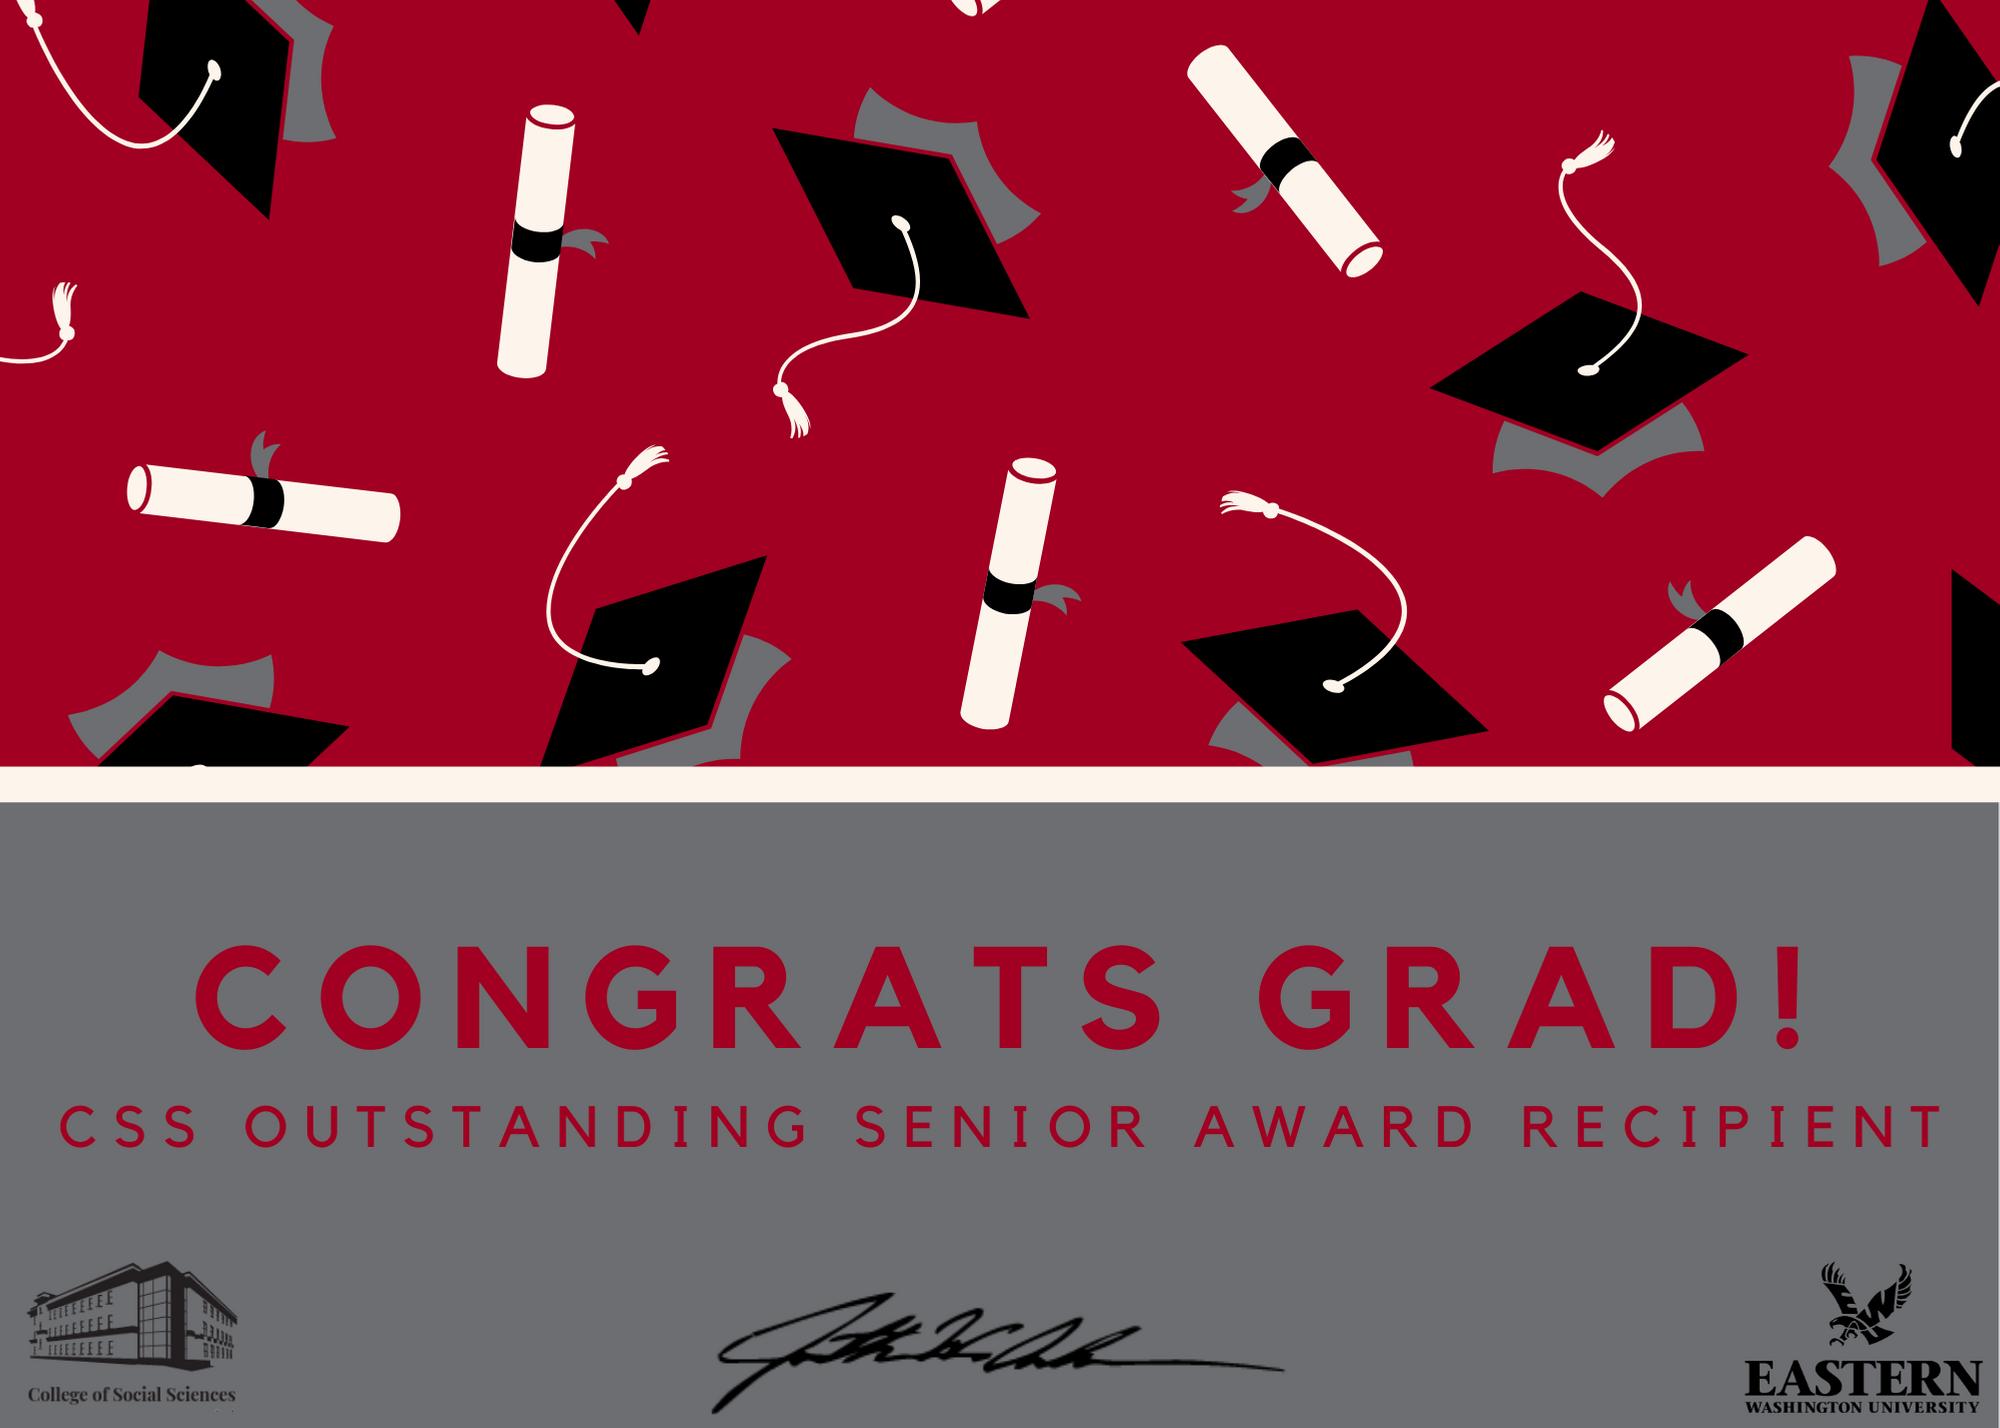 2496-caps-and-diplomas-pattern-graduation-card-2.png